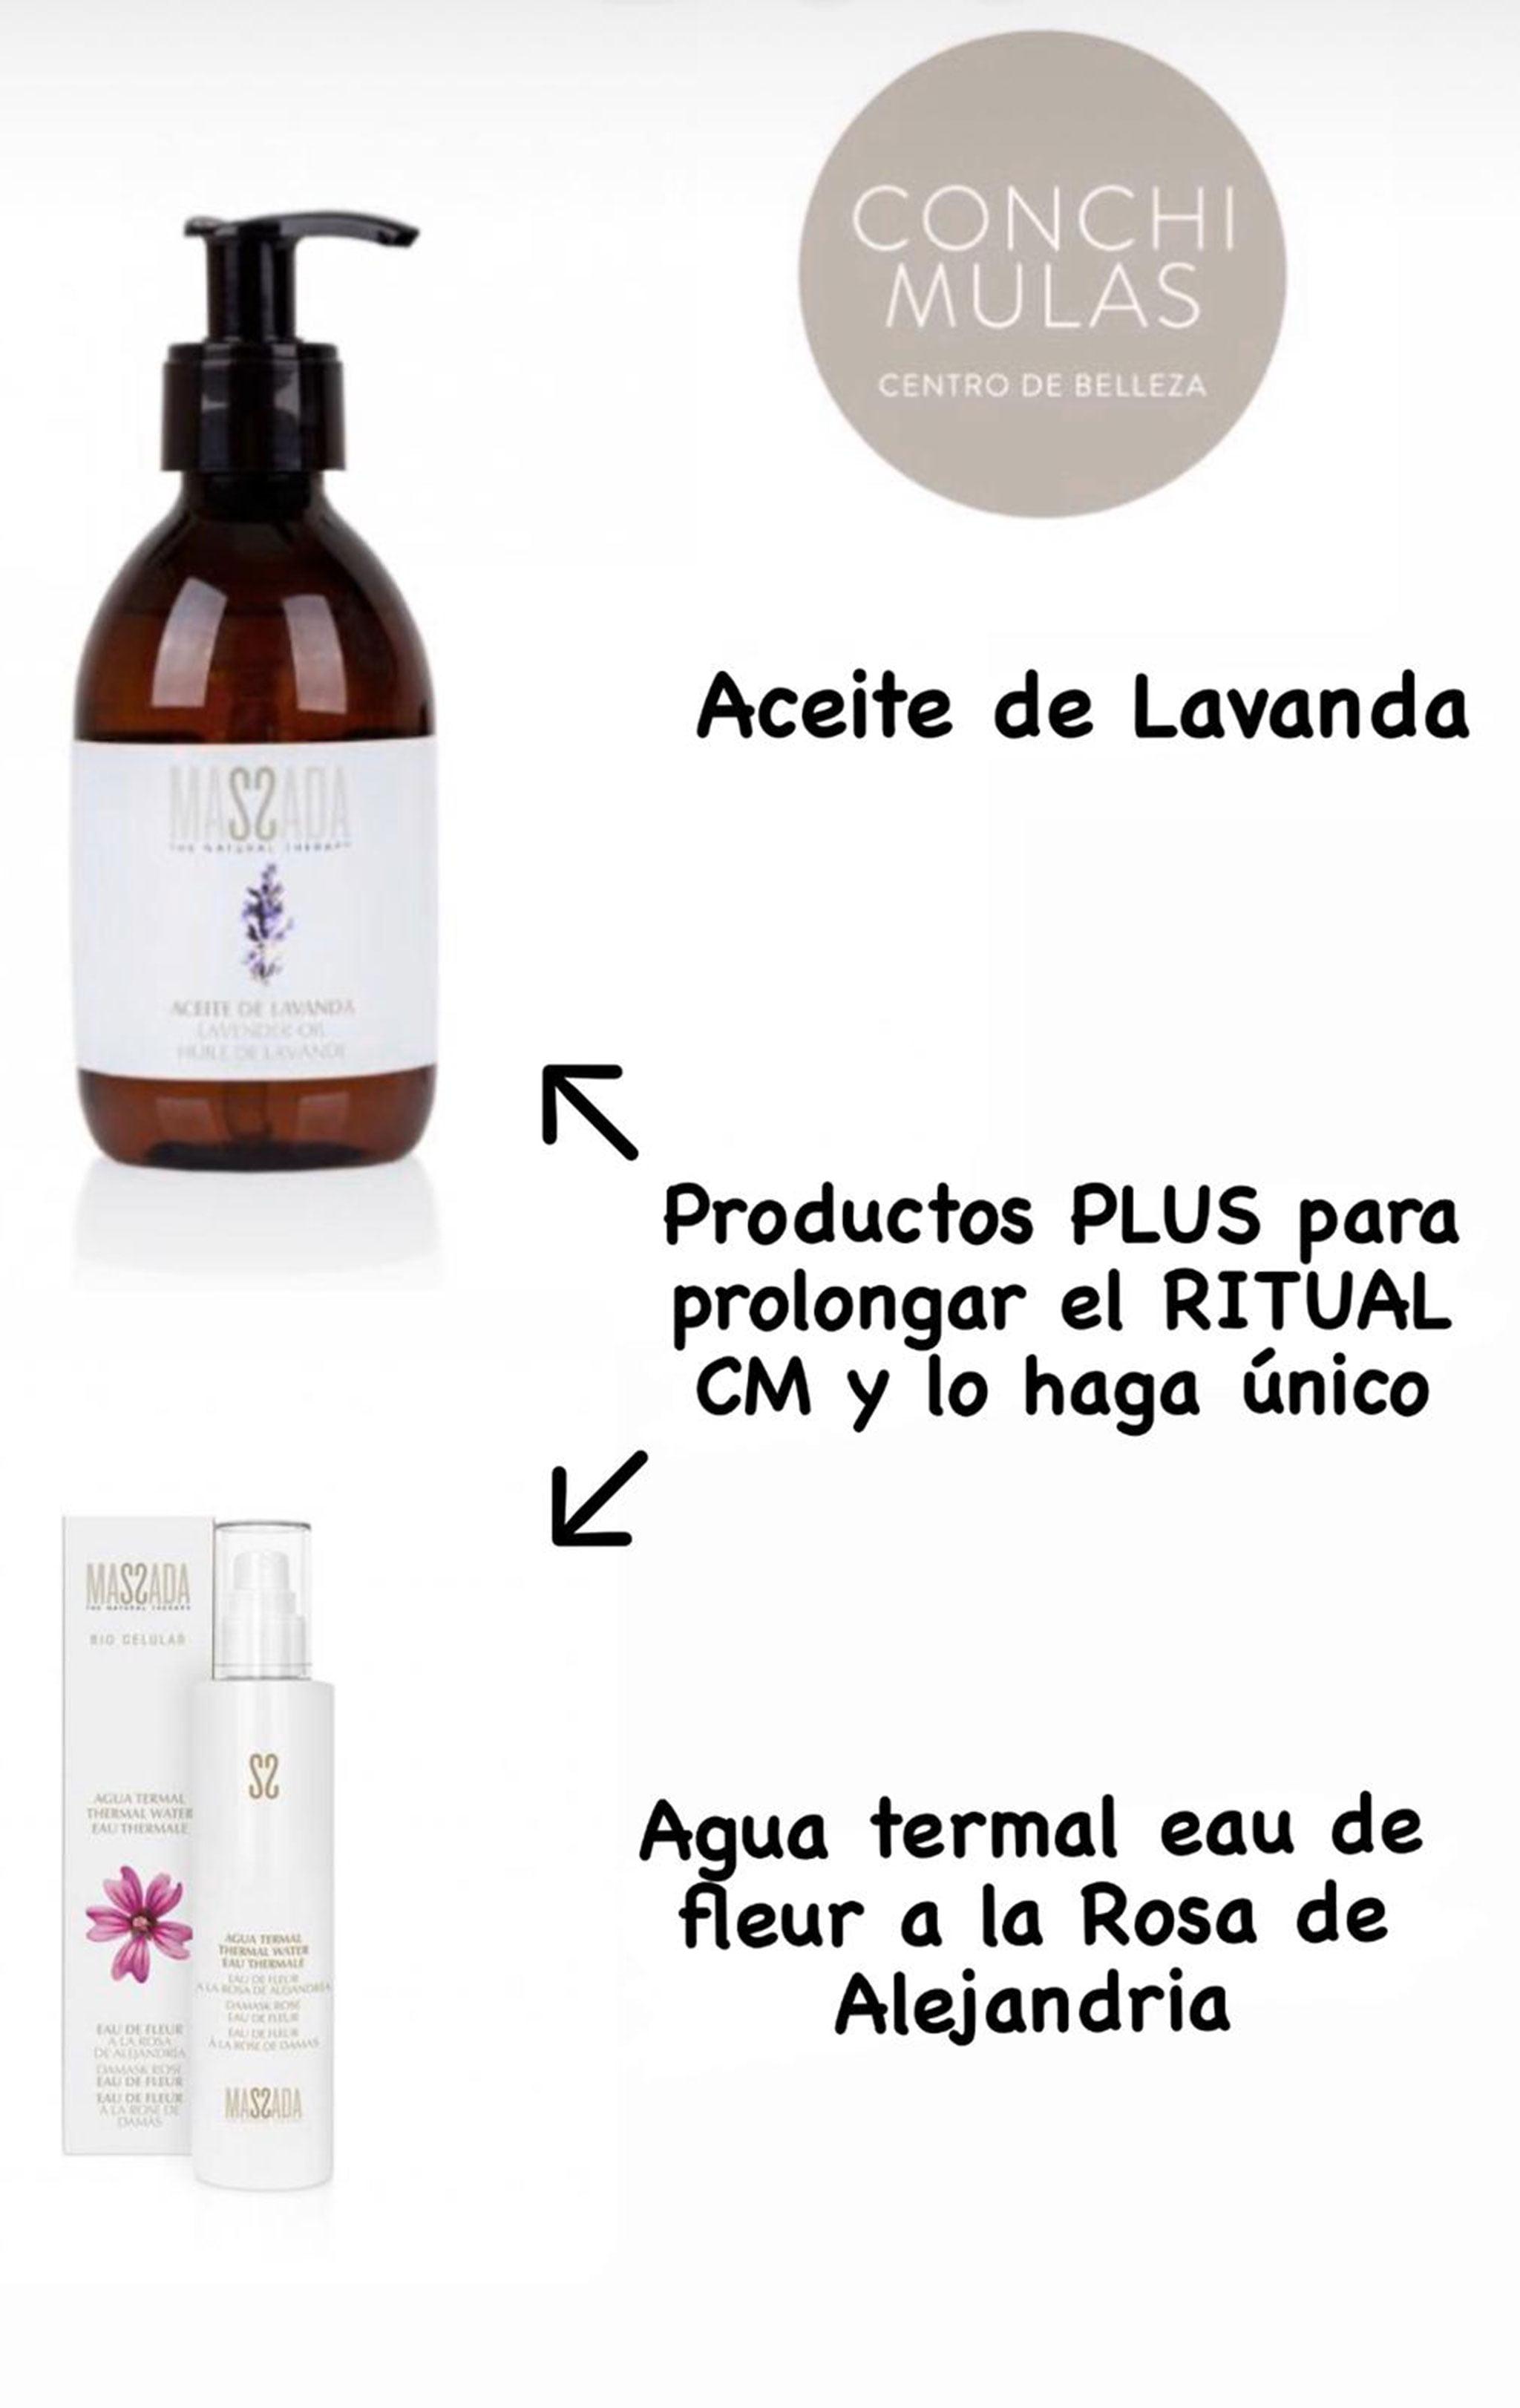 Productos para prolongar el ritual CM – Centro de Estética Conchi Mulas